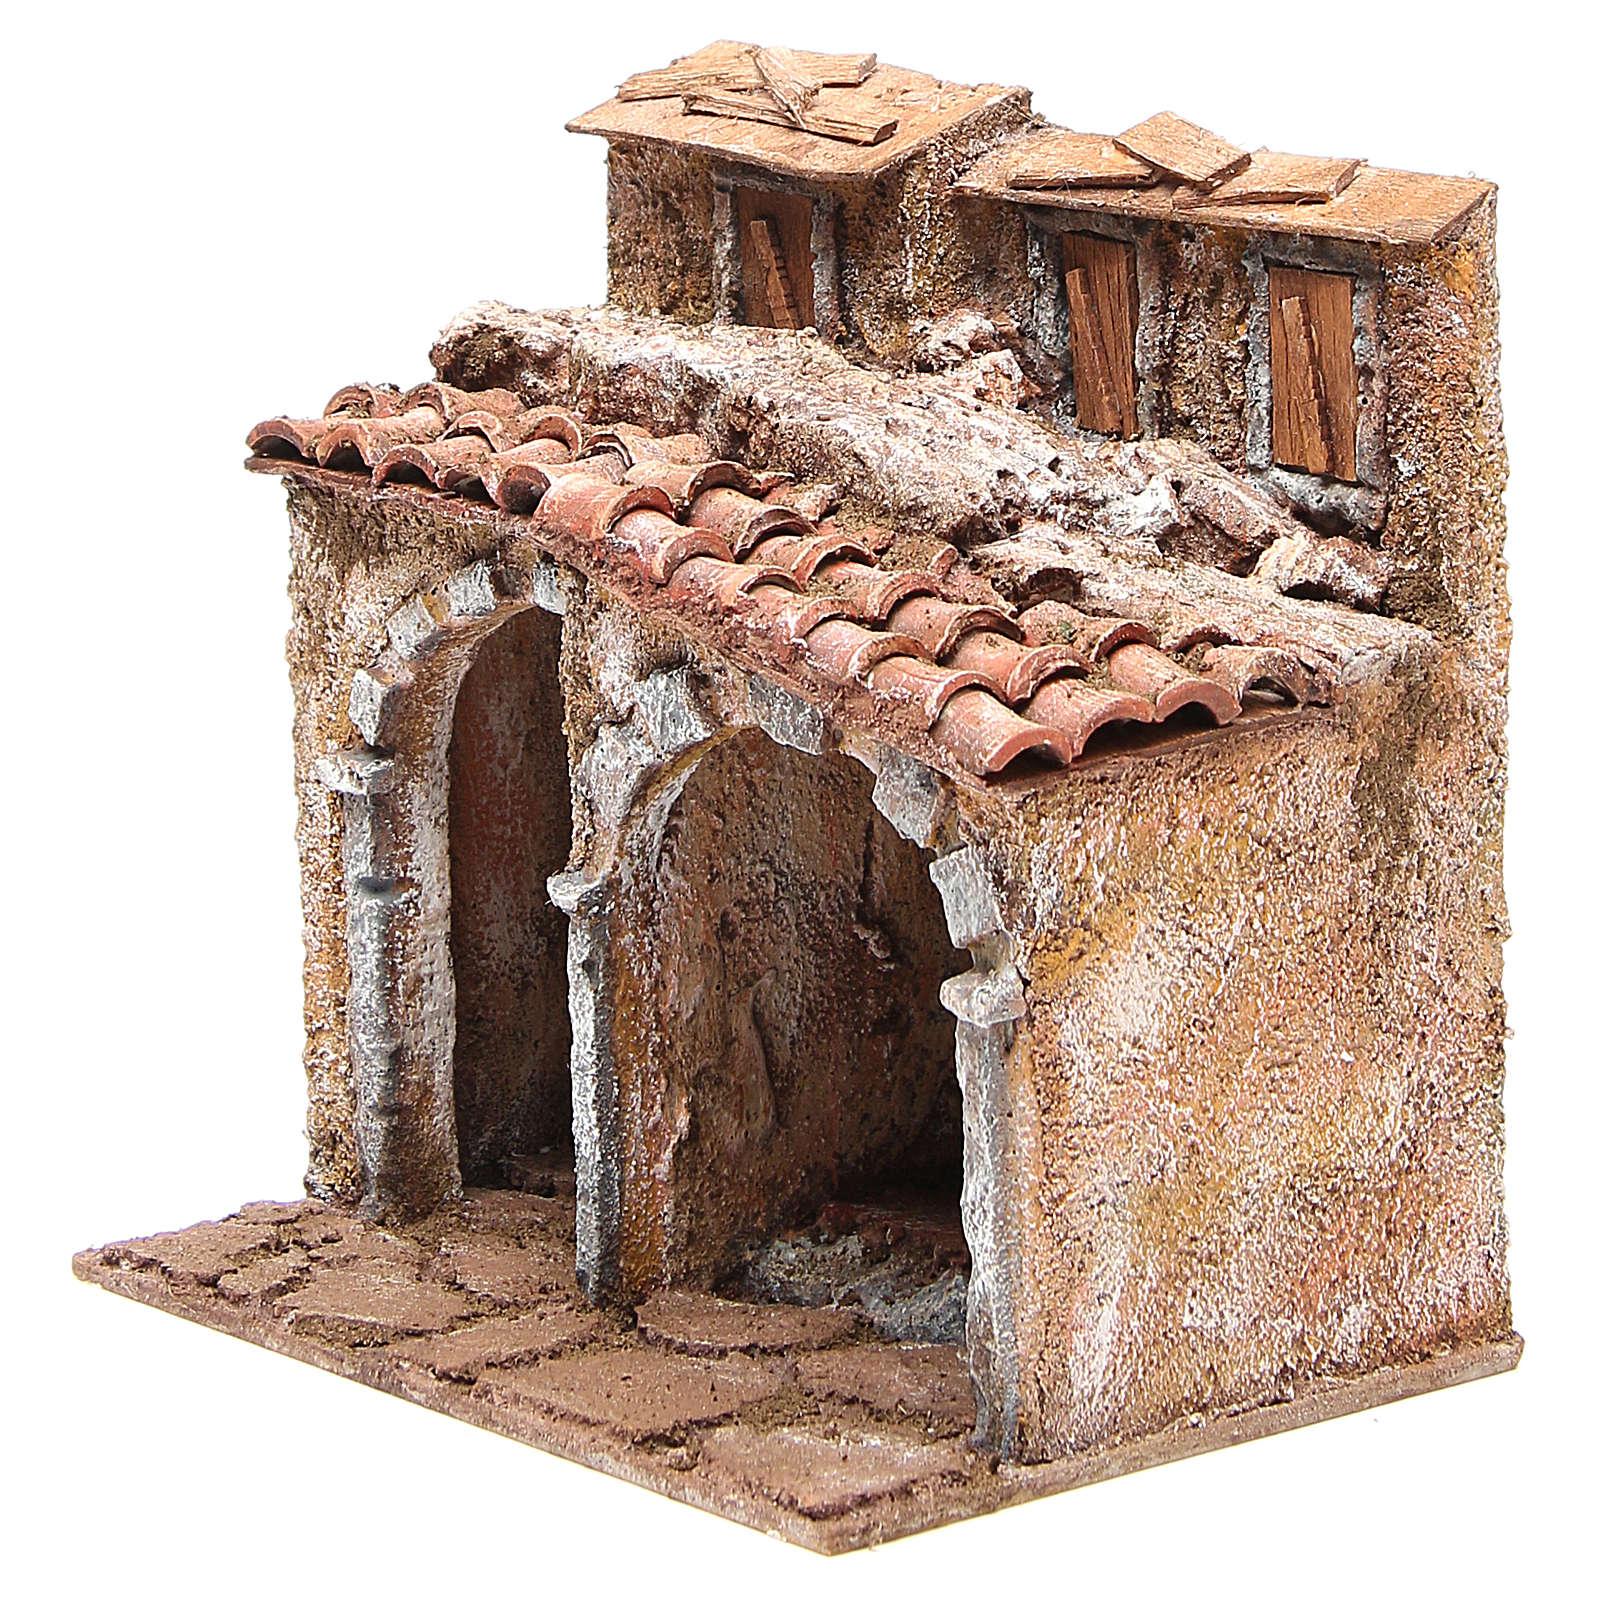 Casetta con capanna rustica presepe 20x25x15 4